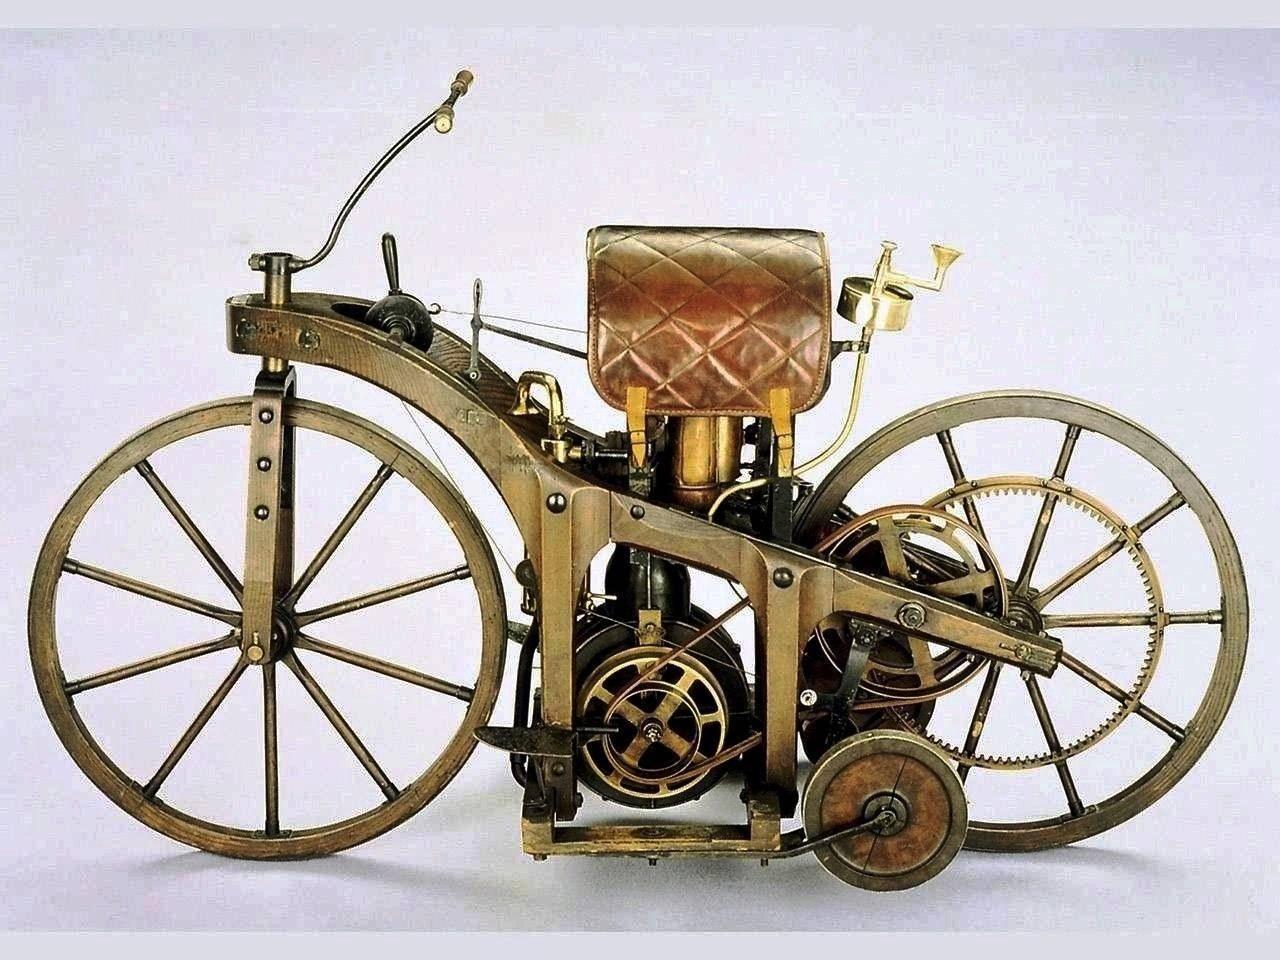 http://4.bp.blogspot.com/-MOlF_Ubgj84/TuxBu1Je1HI/AAAAAAAADmk/ap-Jj8CQJgc/s1600/1885_Daimler_Riding_car_Studio_S_Studio_1280x960_model_car_images_wall_paper_papers_psuperos_pictures_cars_pics.jpg